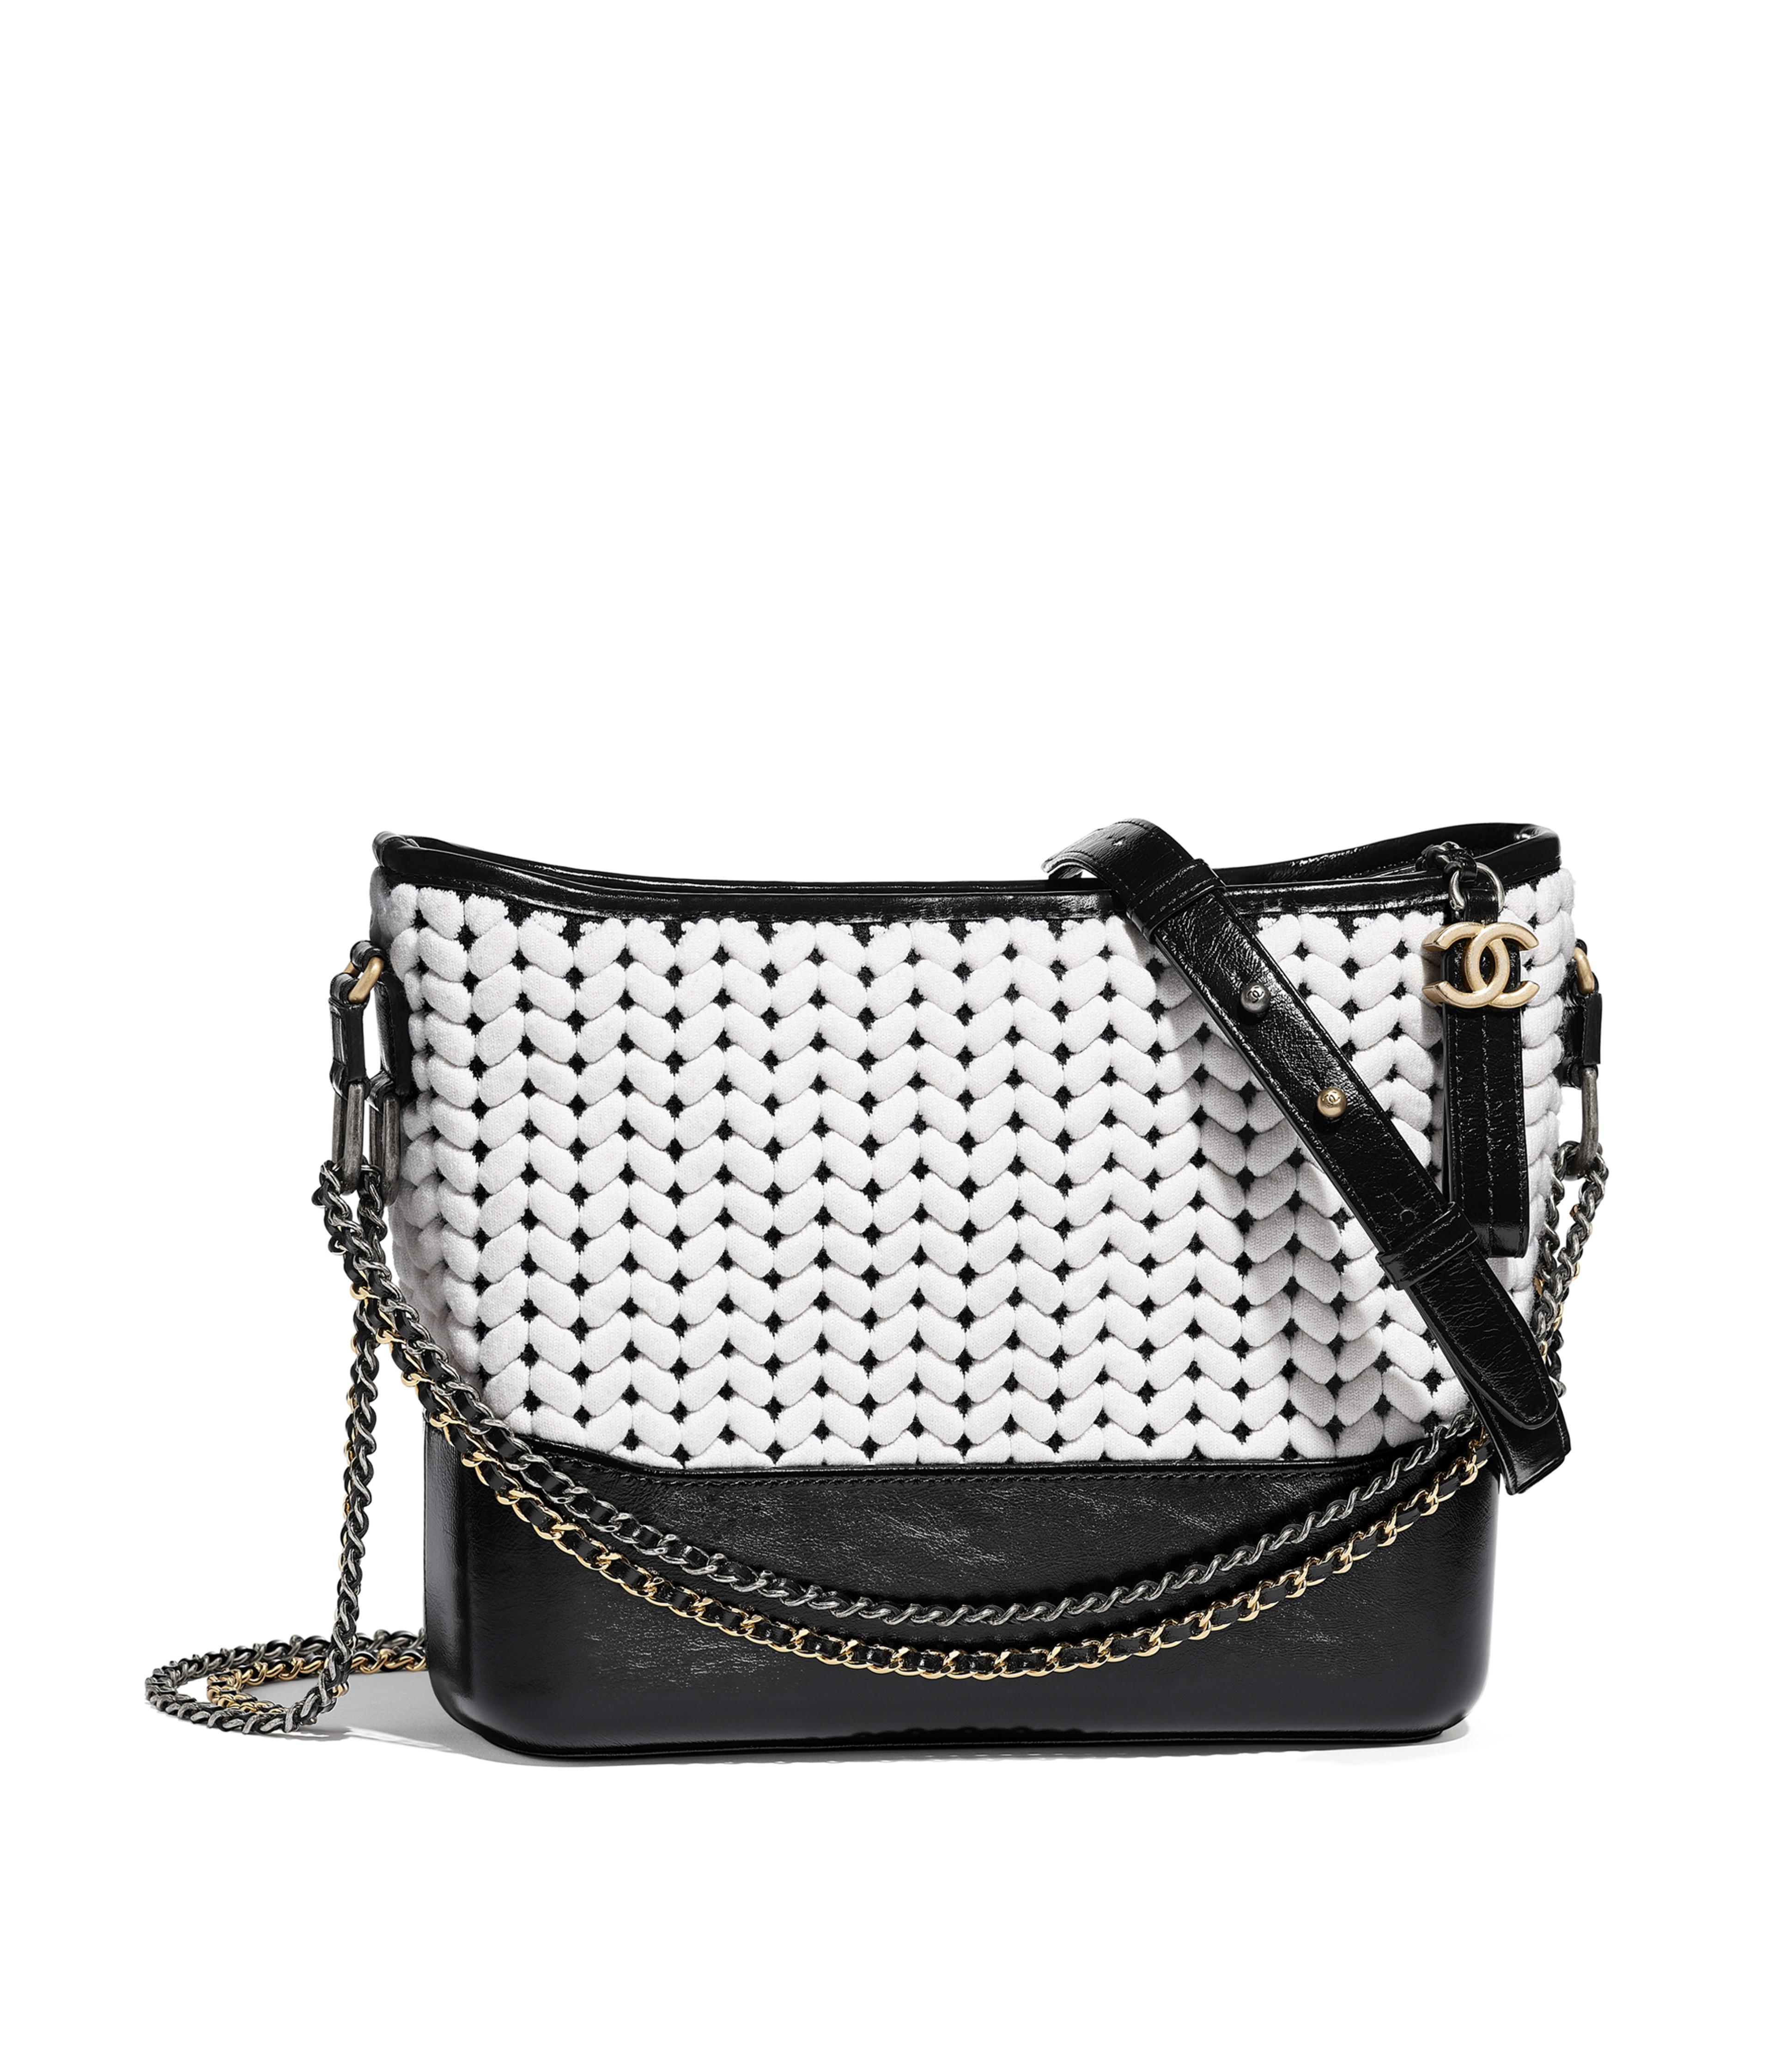 Hobo Bags - Handbags  4c5293aef9368